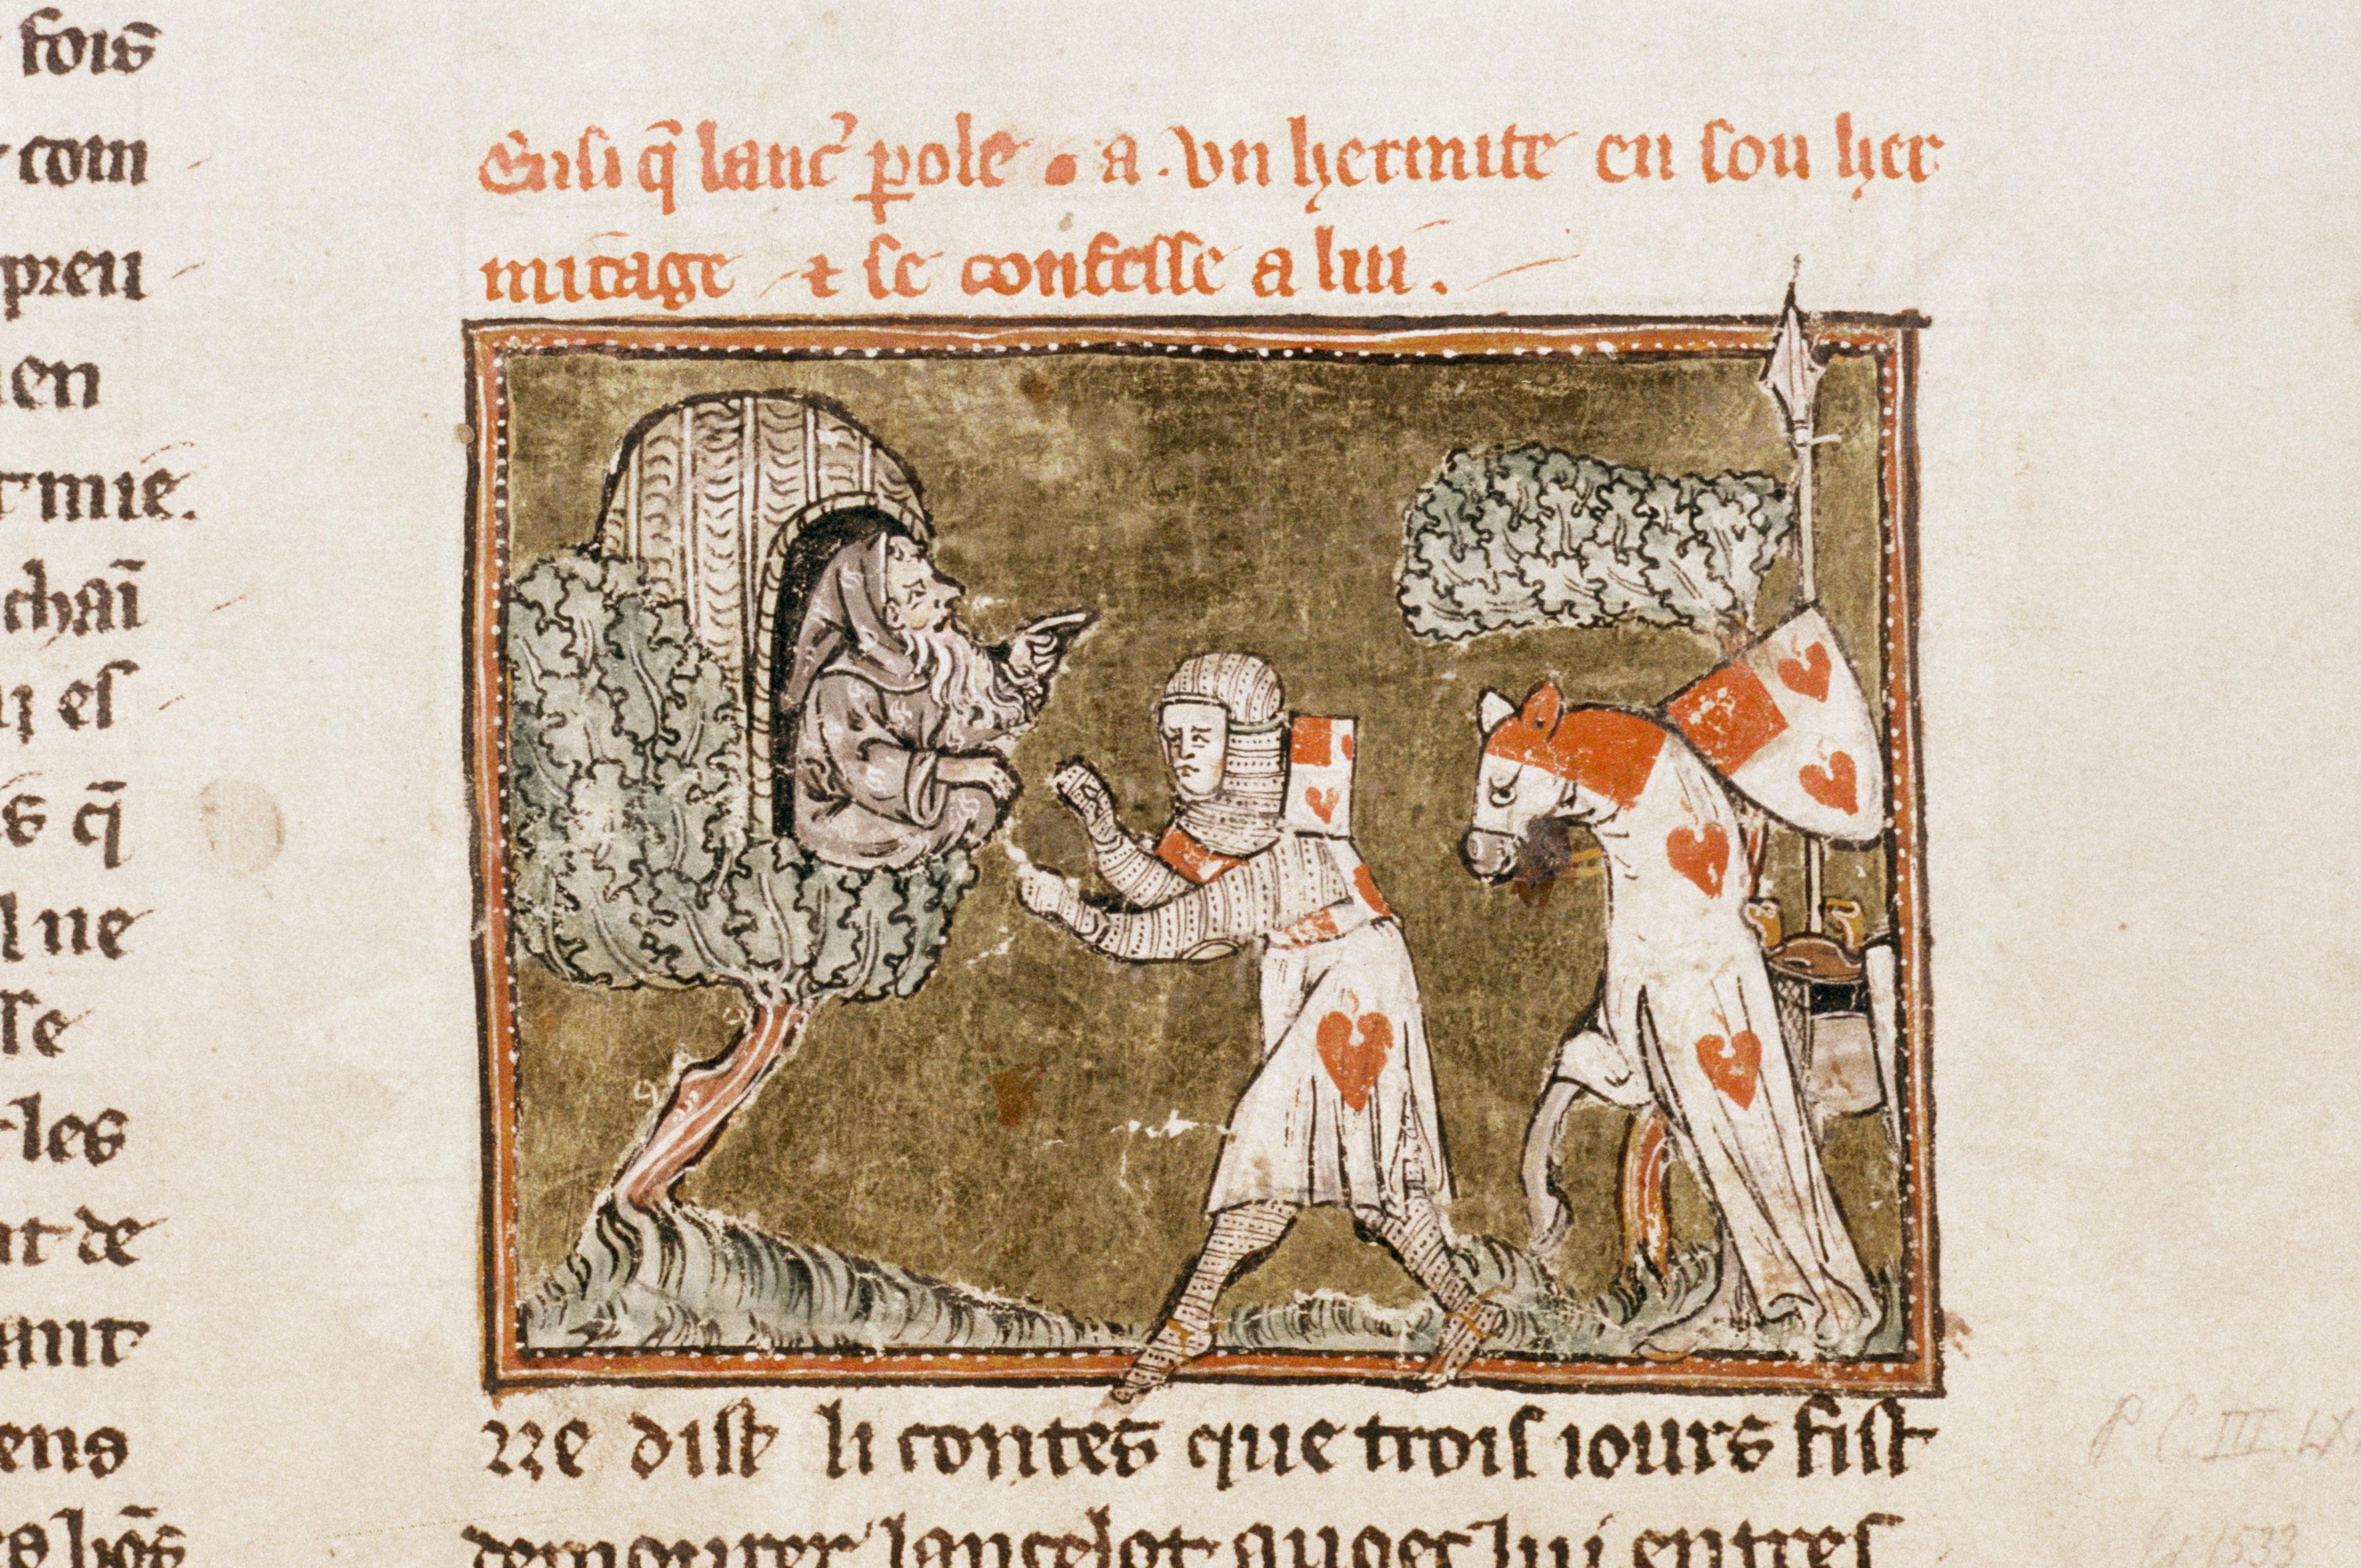 Bodleian-Library-MS-Douce-215_00040_fol-014r